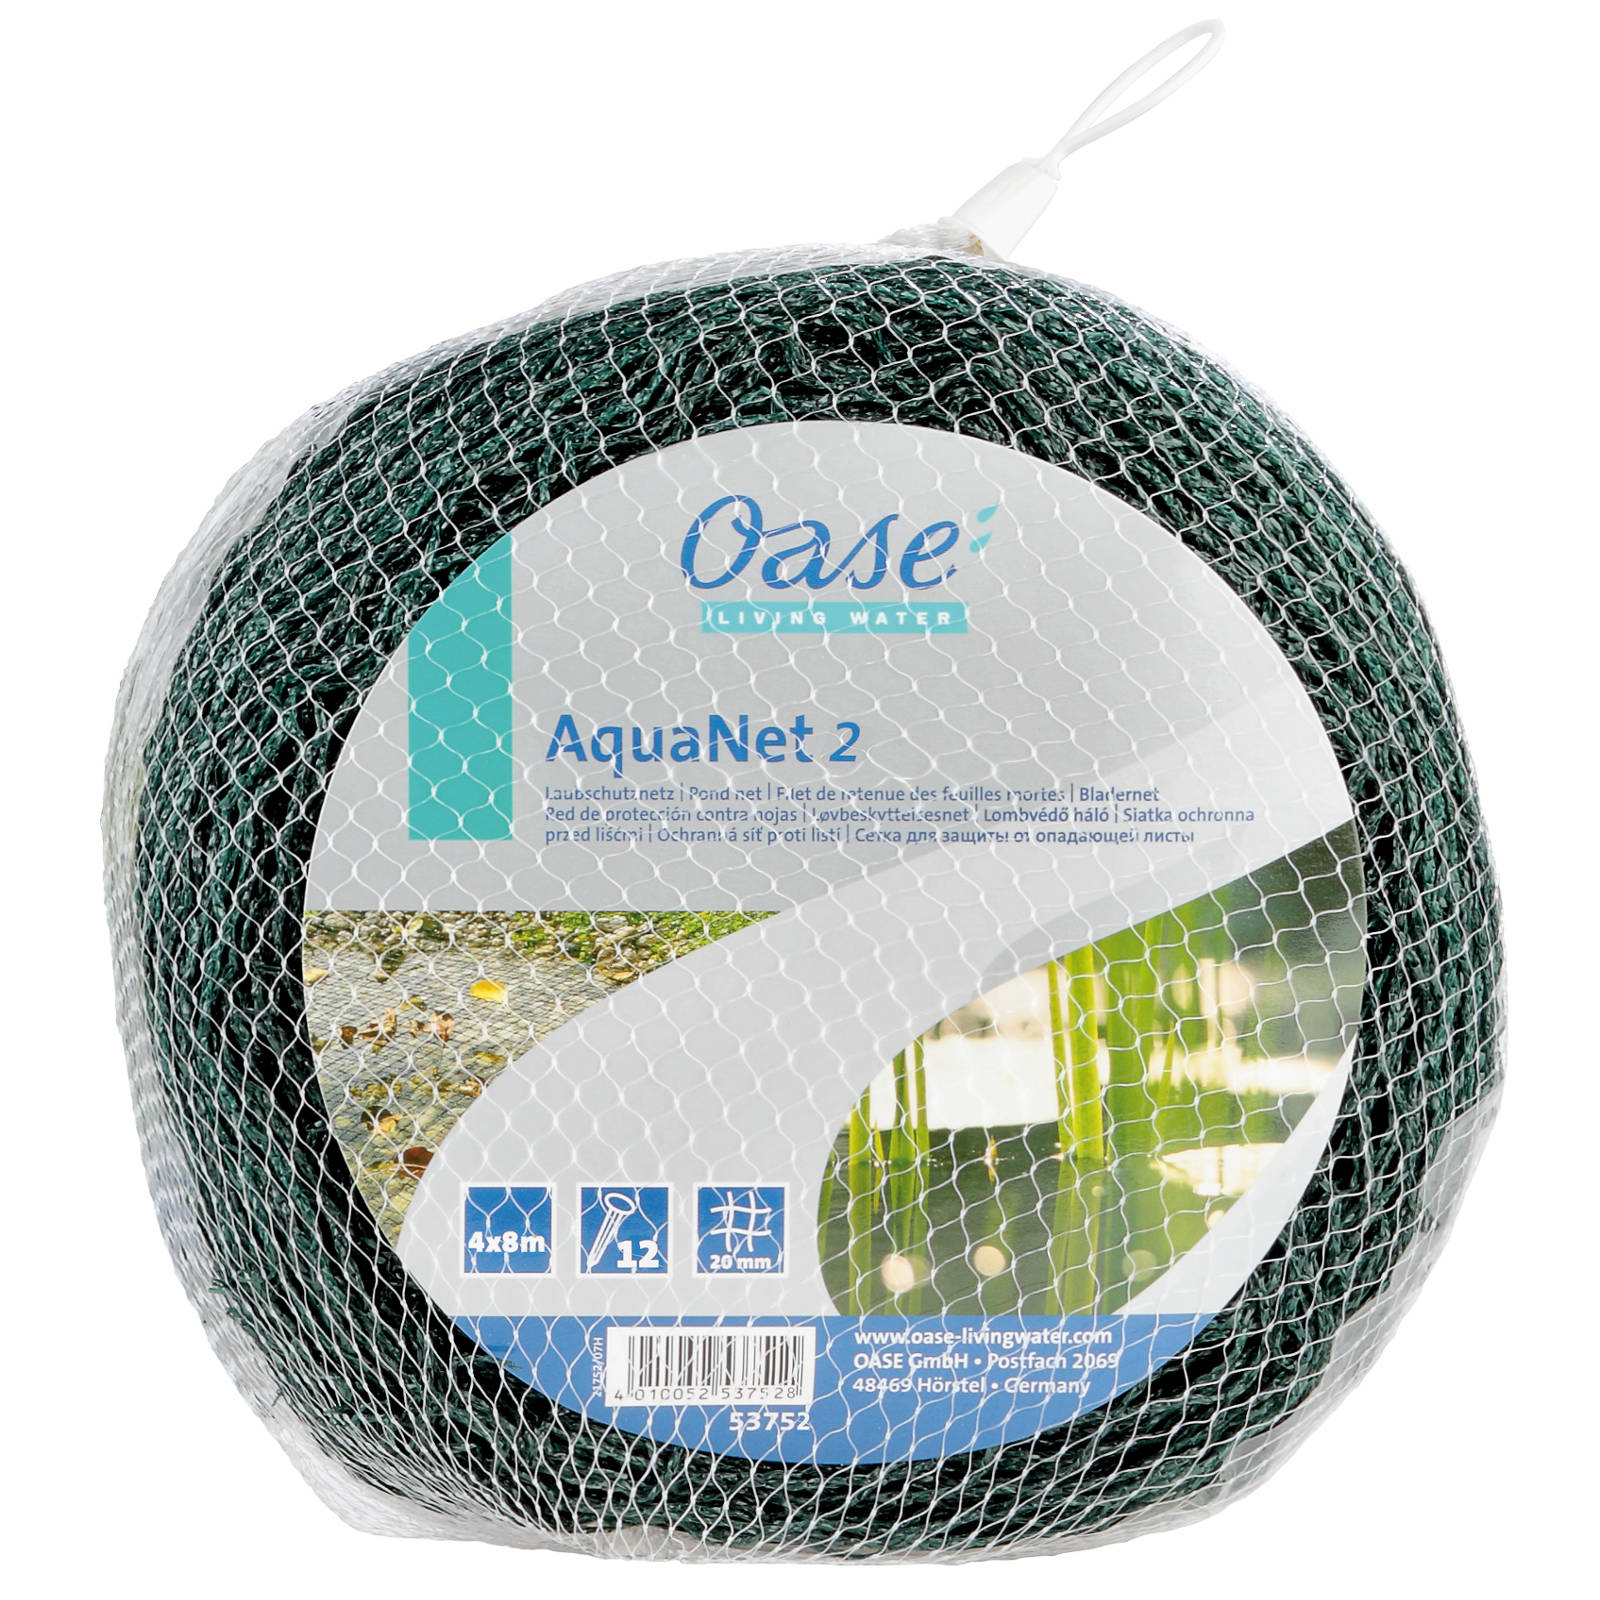 Oase AquaNet Teichnetz 2 / 4 x 8 m